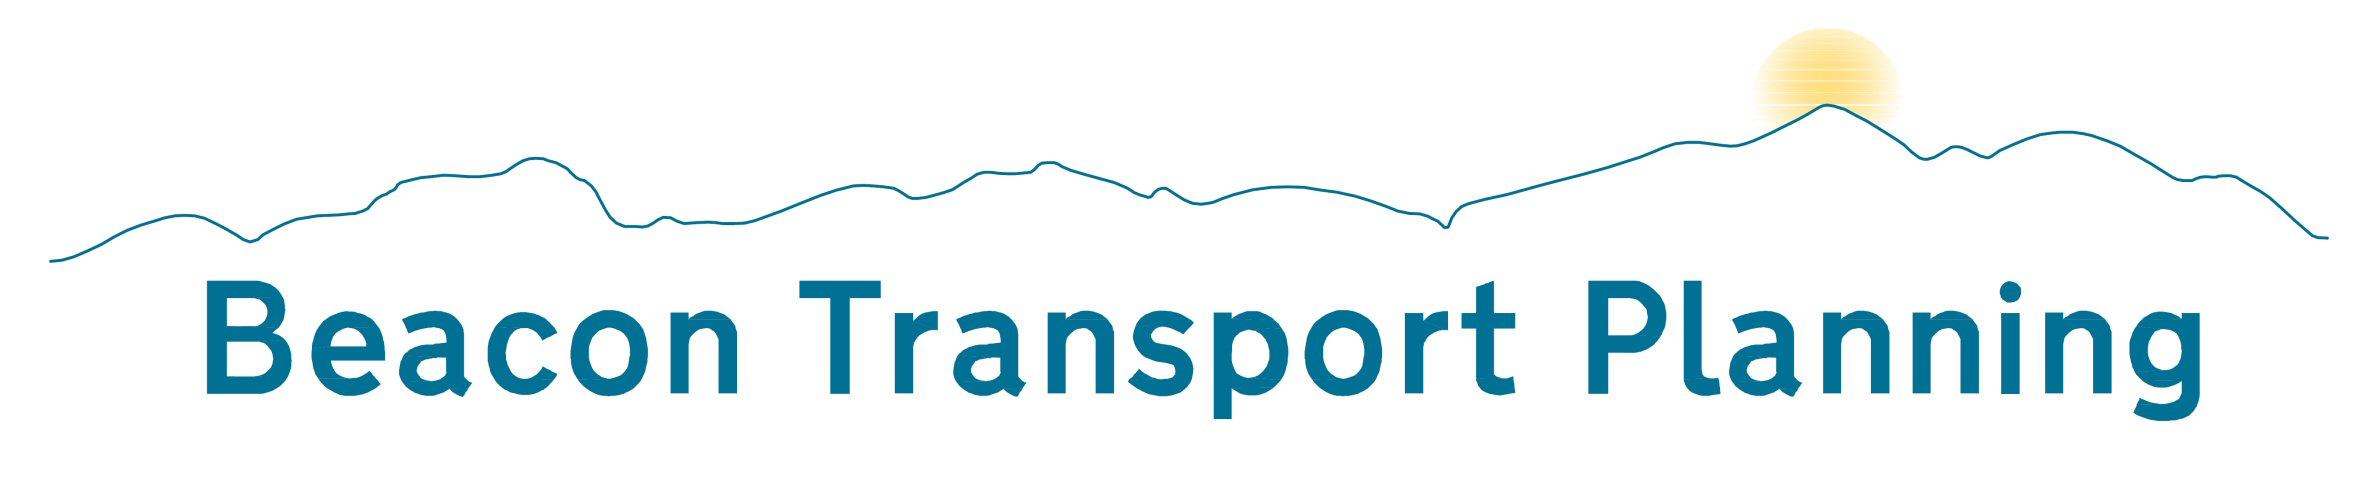 Beacon Transport Planning